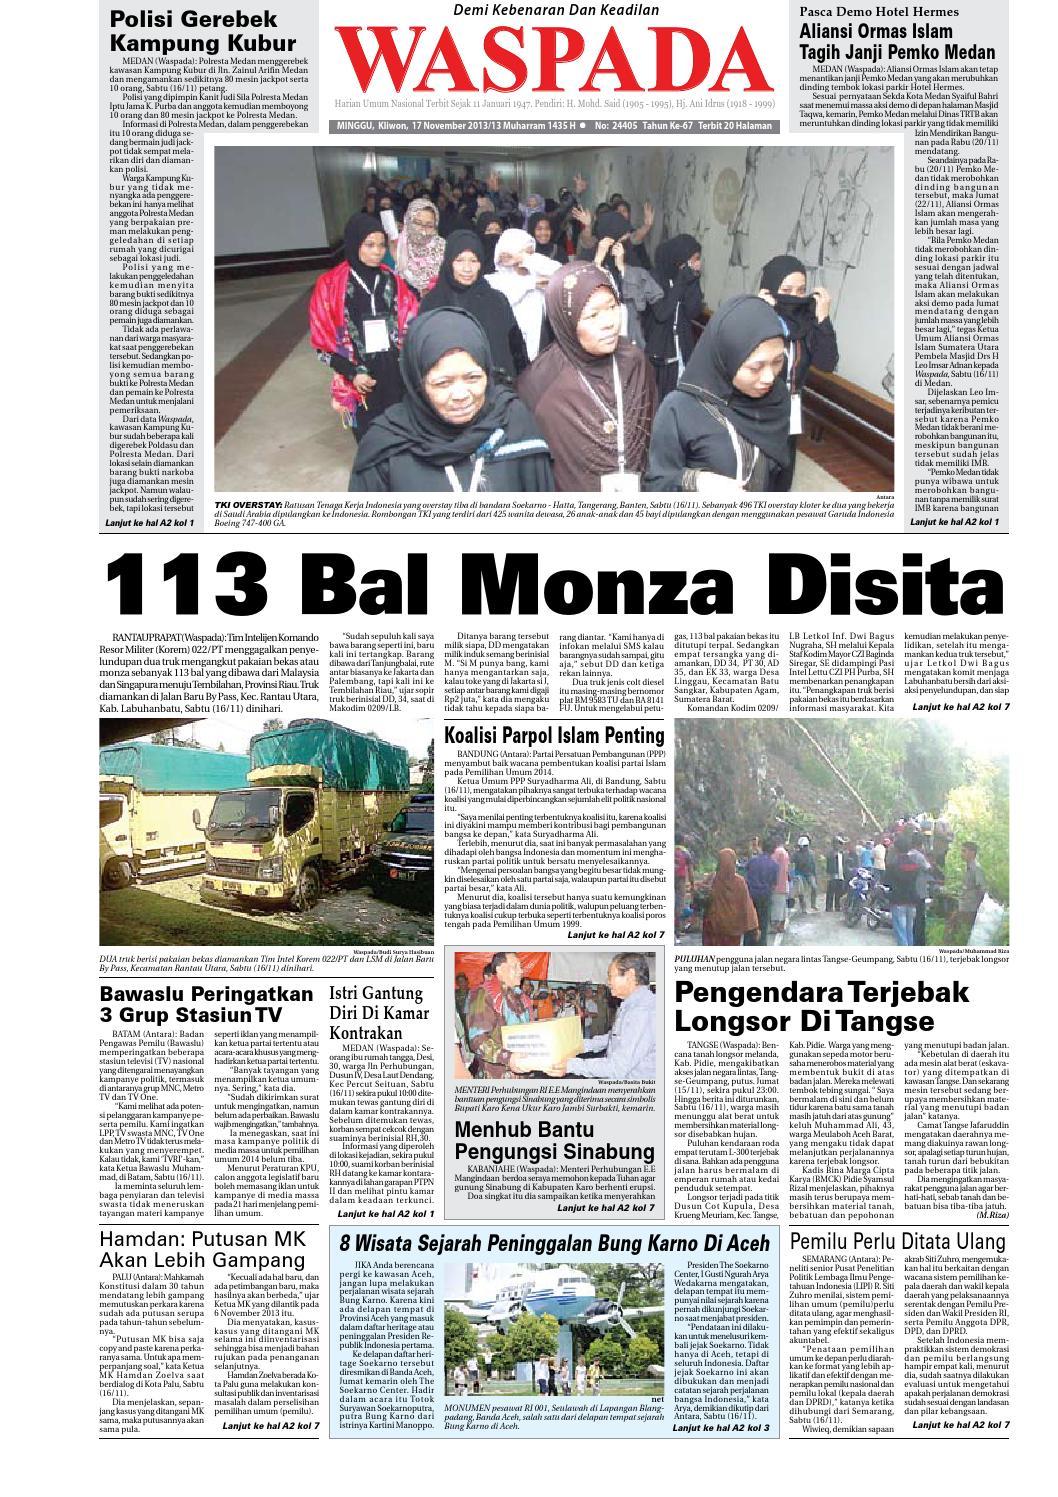 Waspada Minggu 6 September 2015 By Harian Issuu Camilan Busa Kepiting Indahamp039s Fresh Ui 17 Nopember 2013